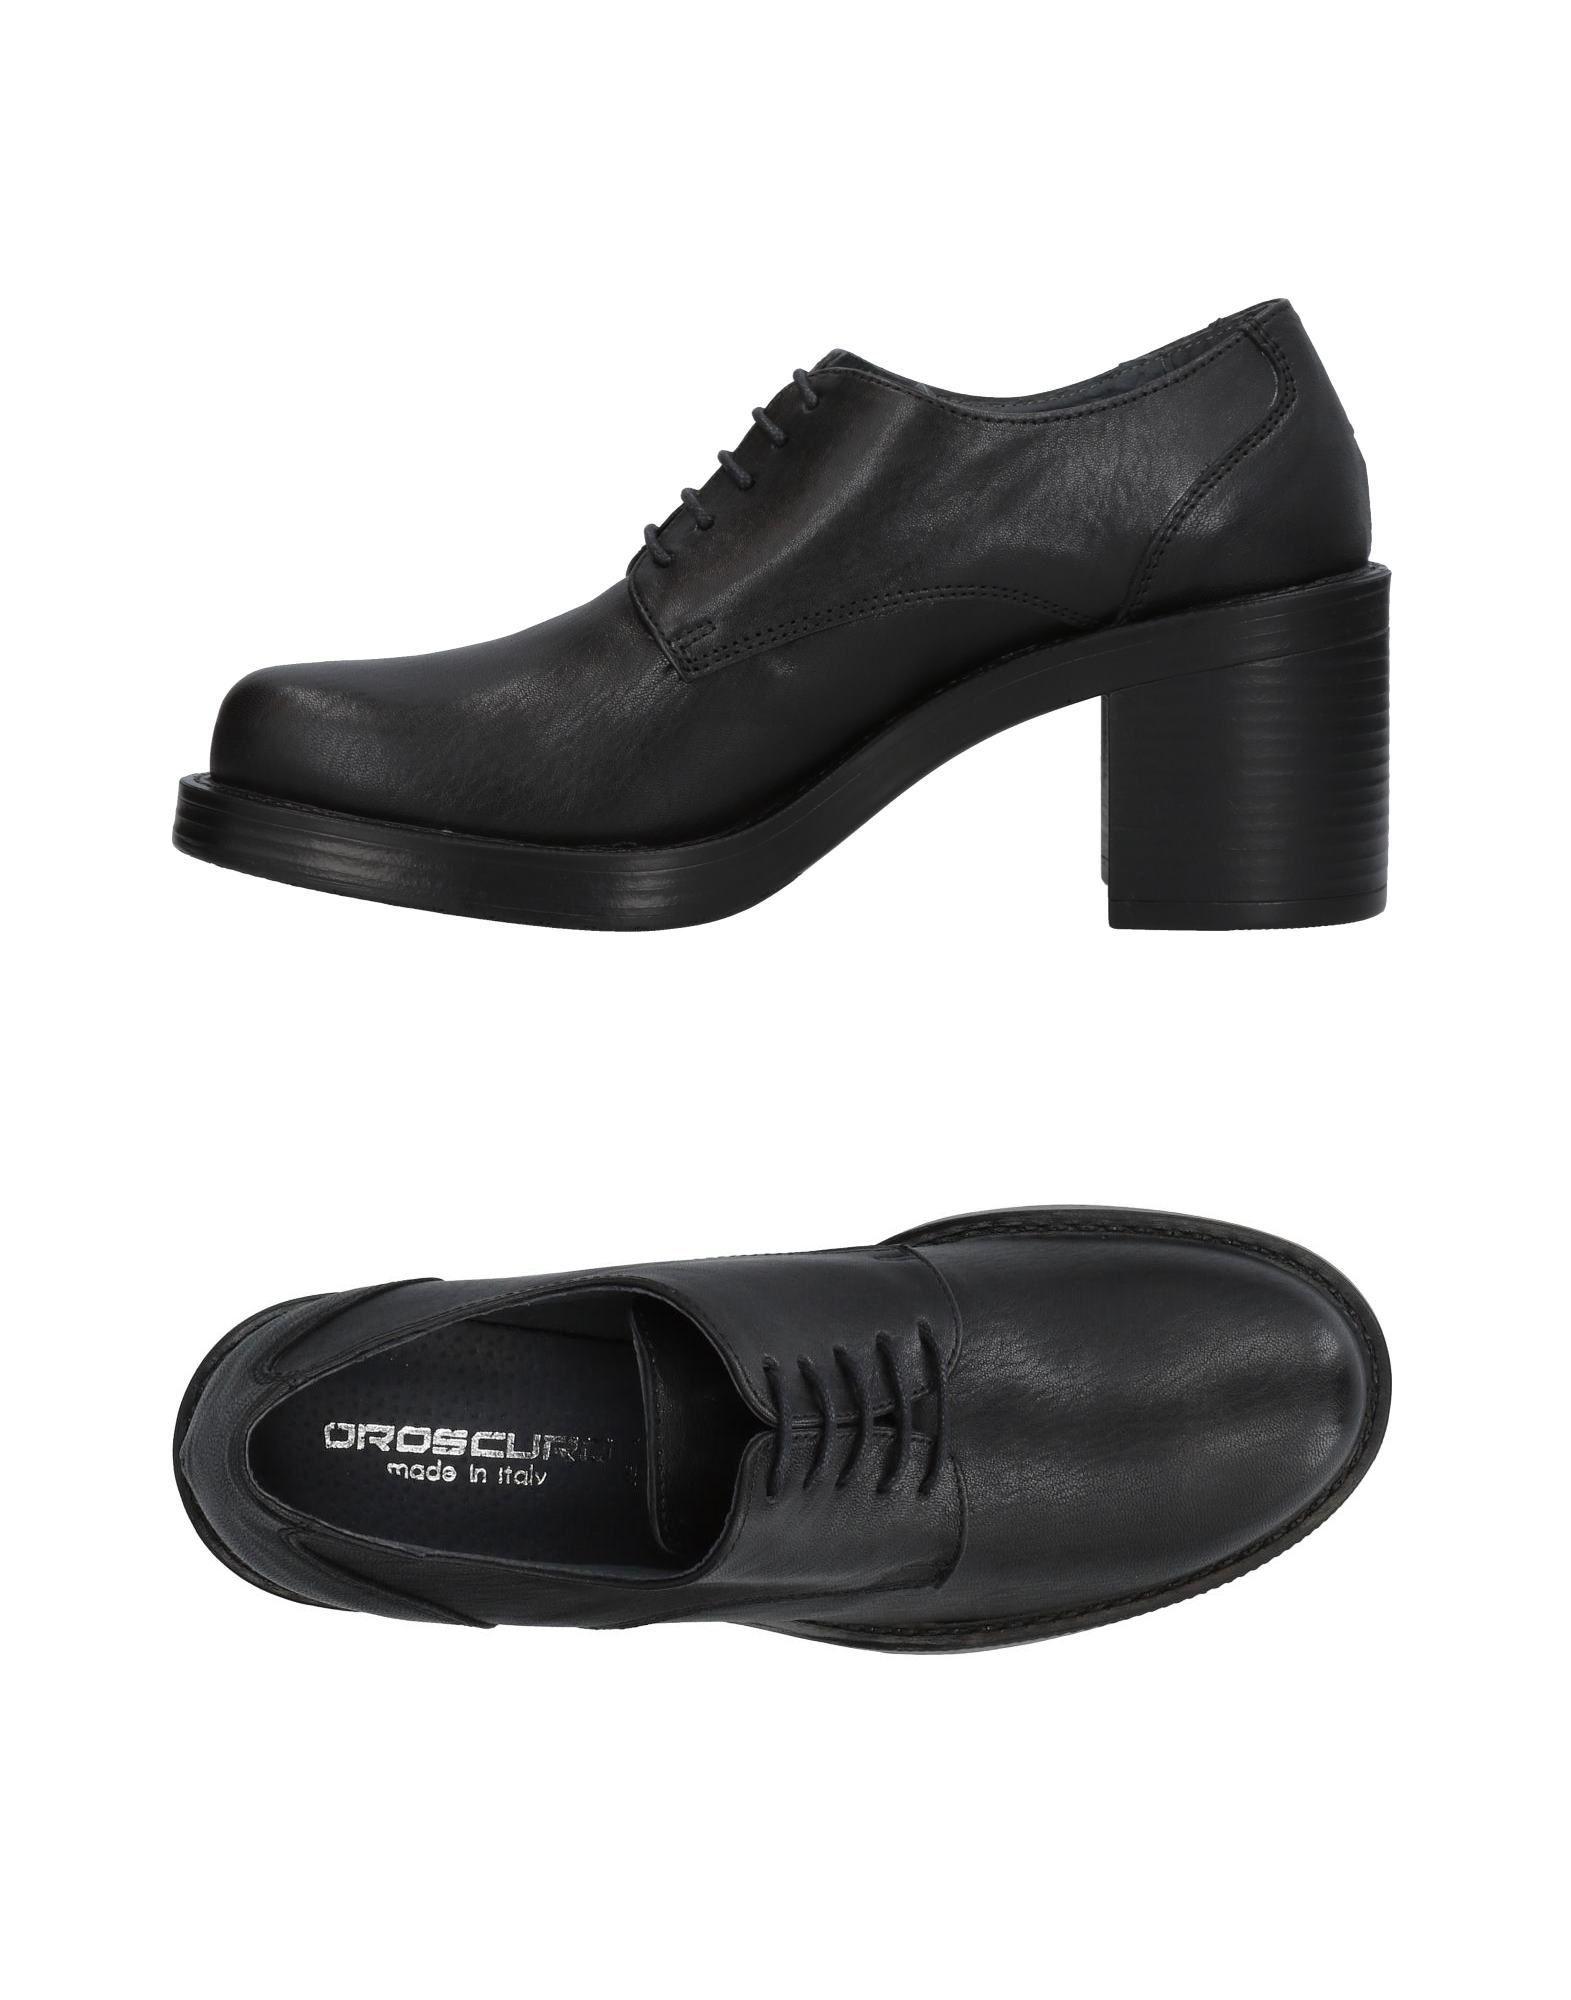 Фото - OROSCURO Обувь на шнурках обувь на высокой платформе dkny